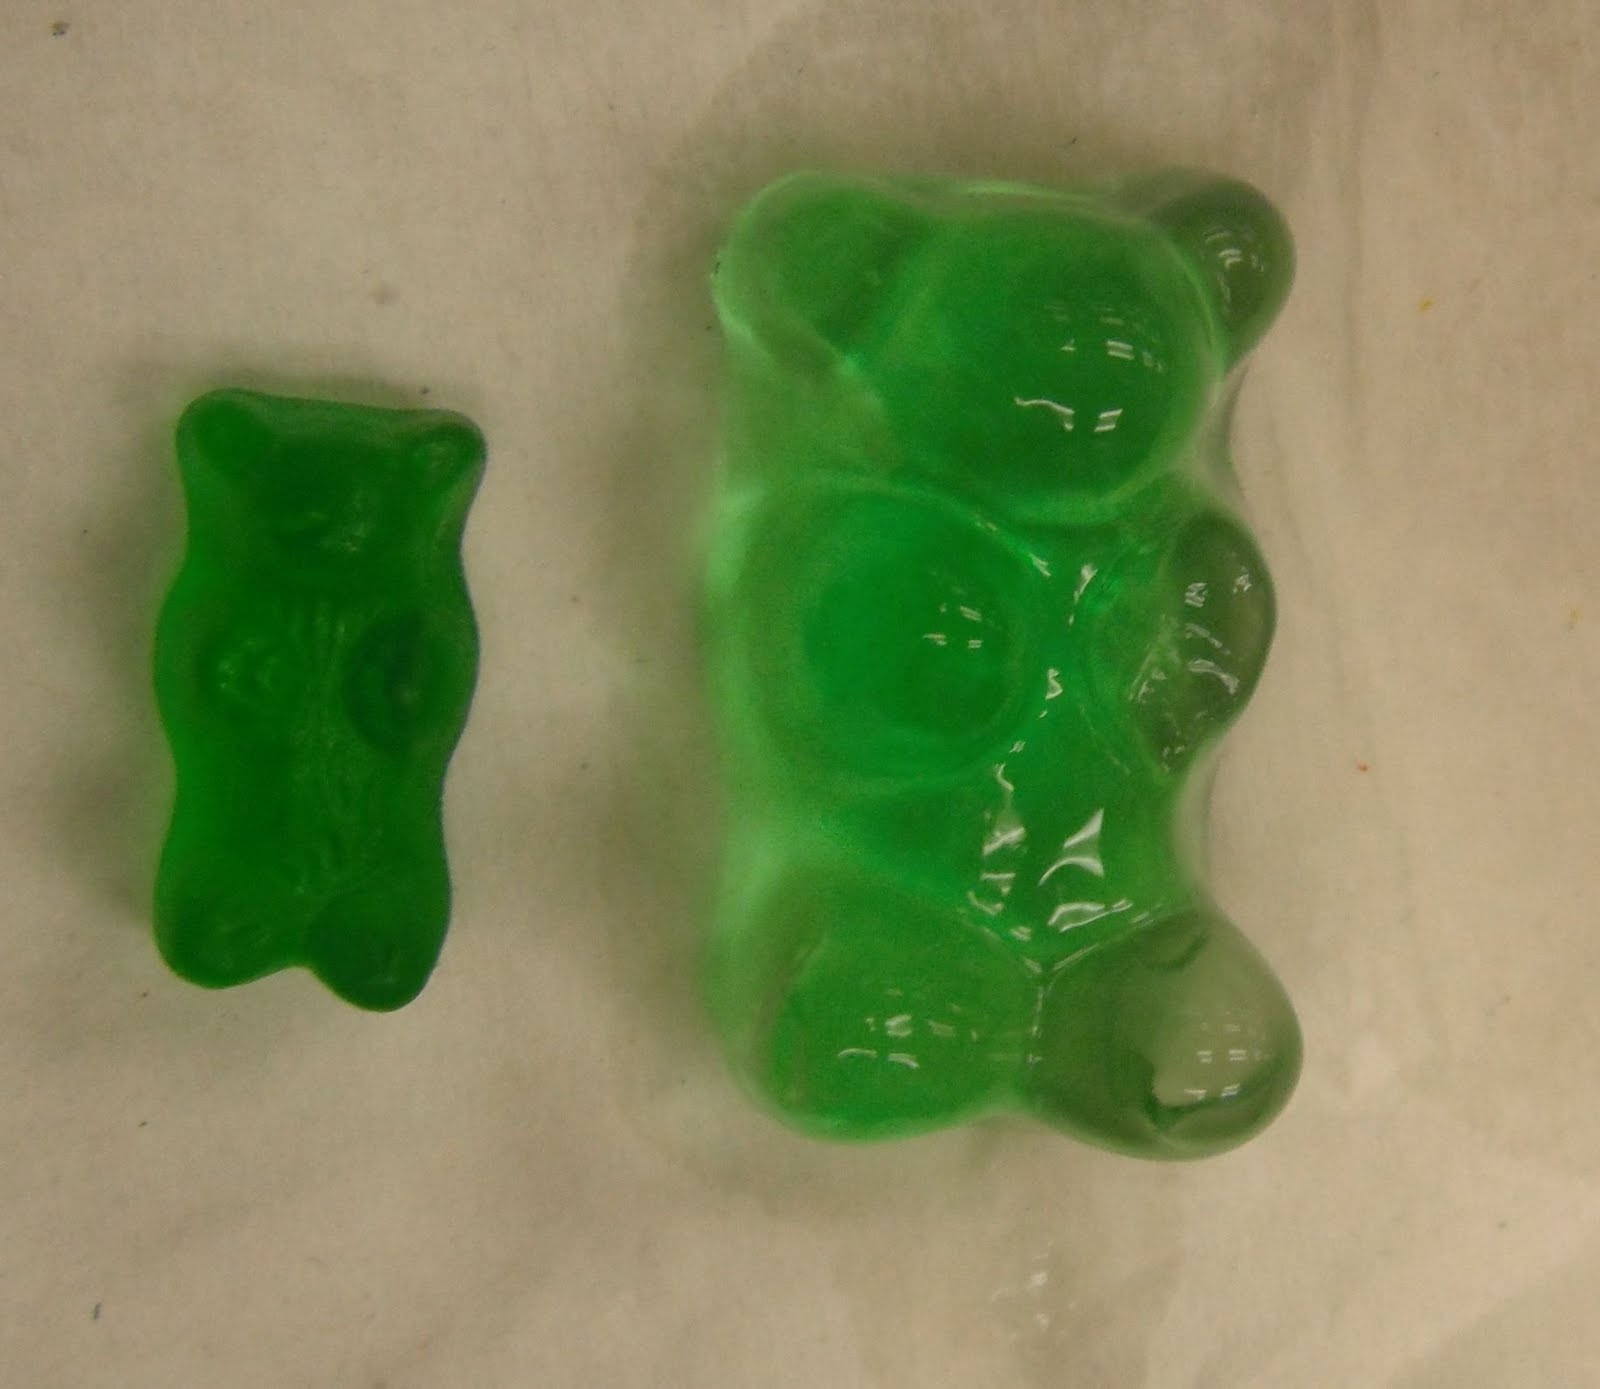 Ms J's Chemistry Class: Recap of gummy bears experiment